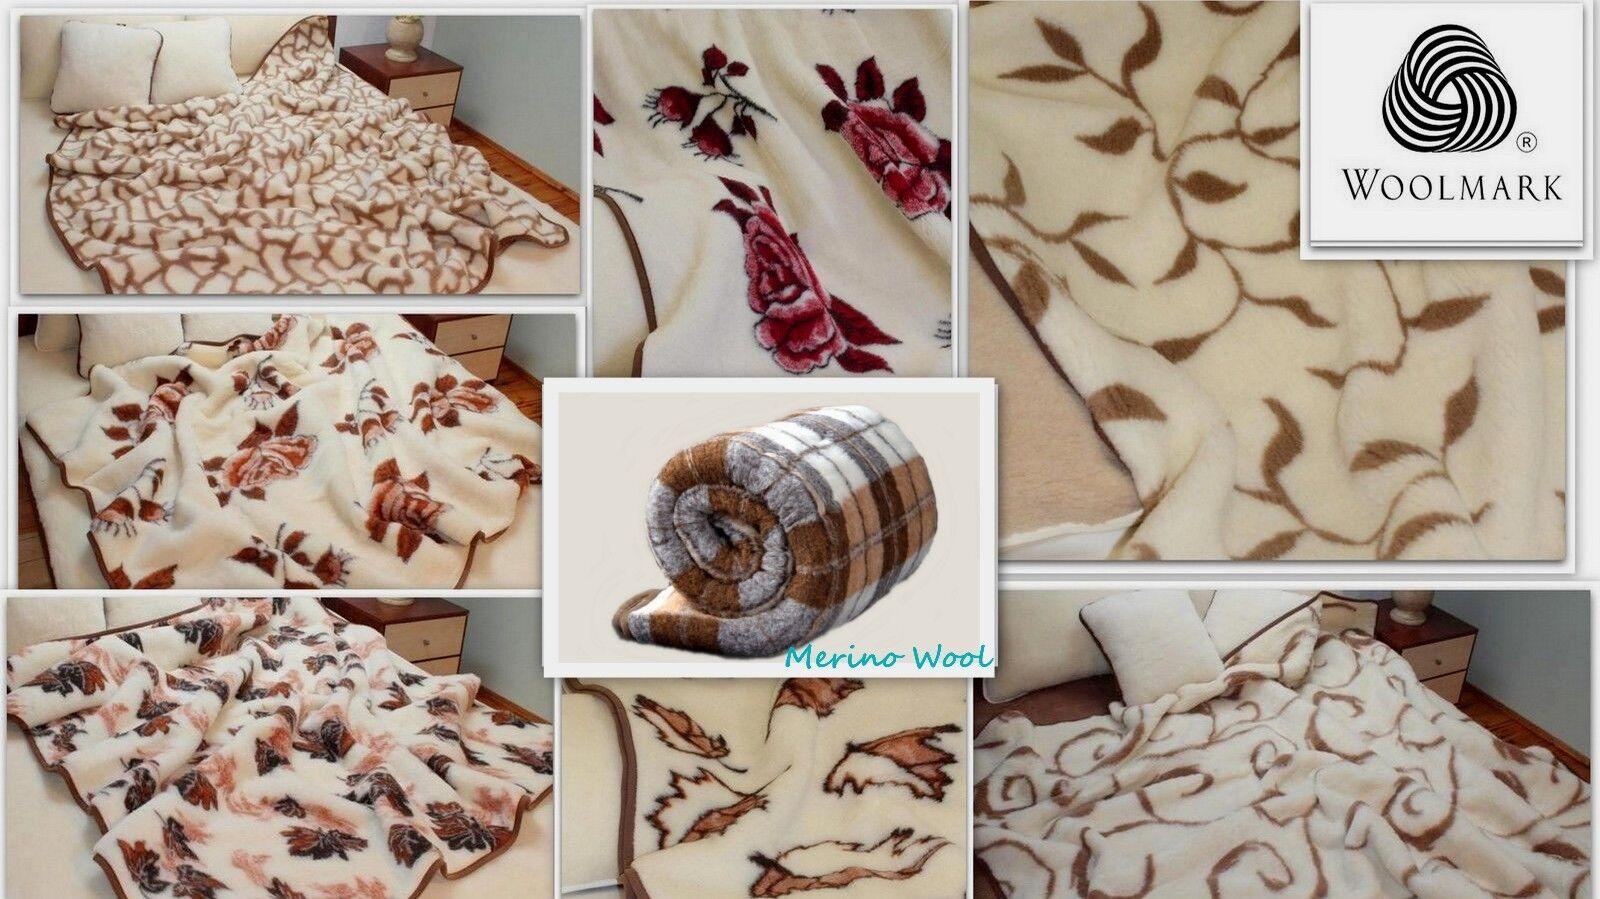 Oferta Woolmark Lana de Merino Pura Sofá de Manta Almohadilla Manta 100% Natural